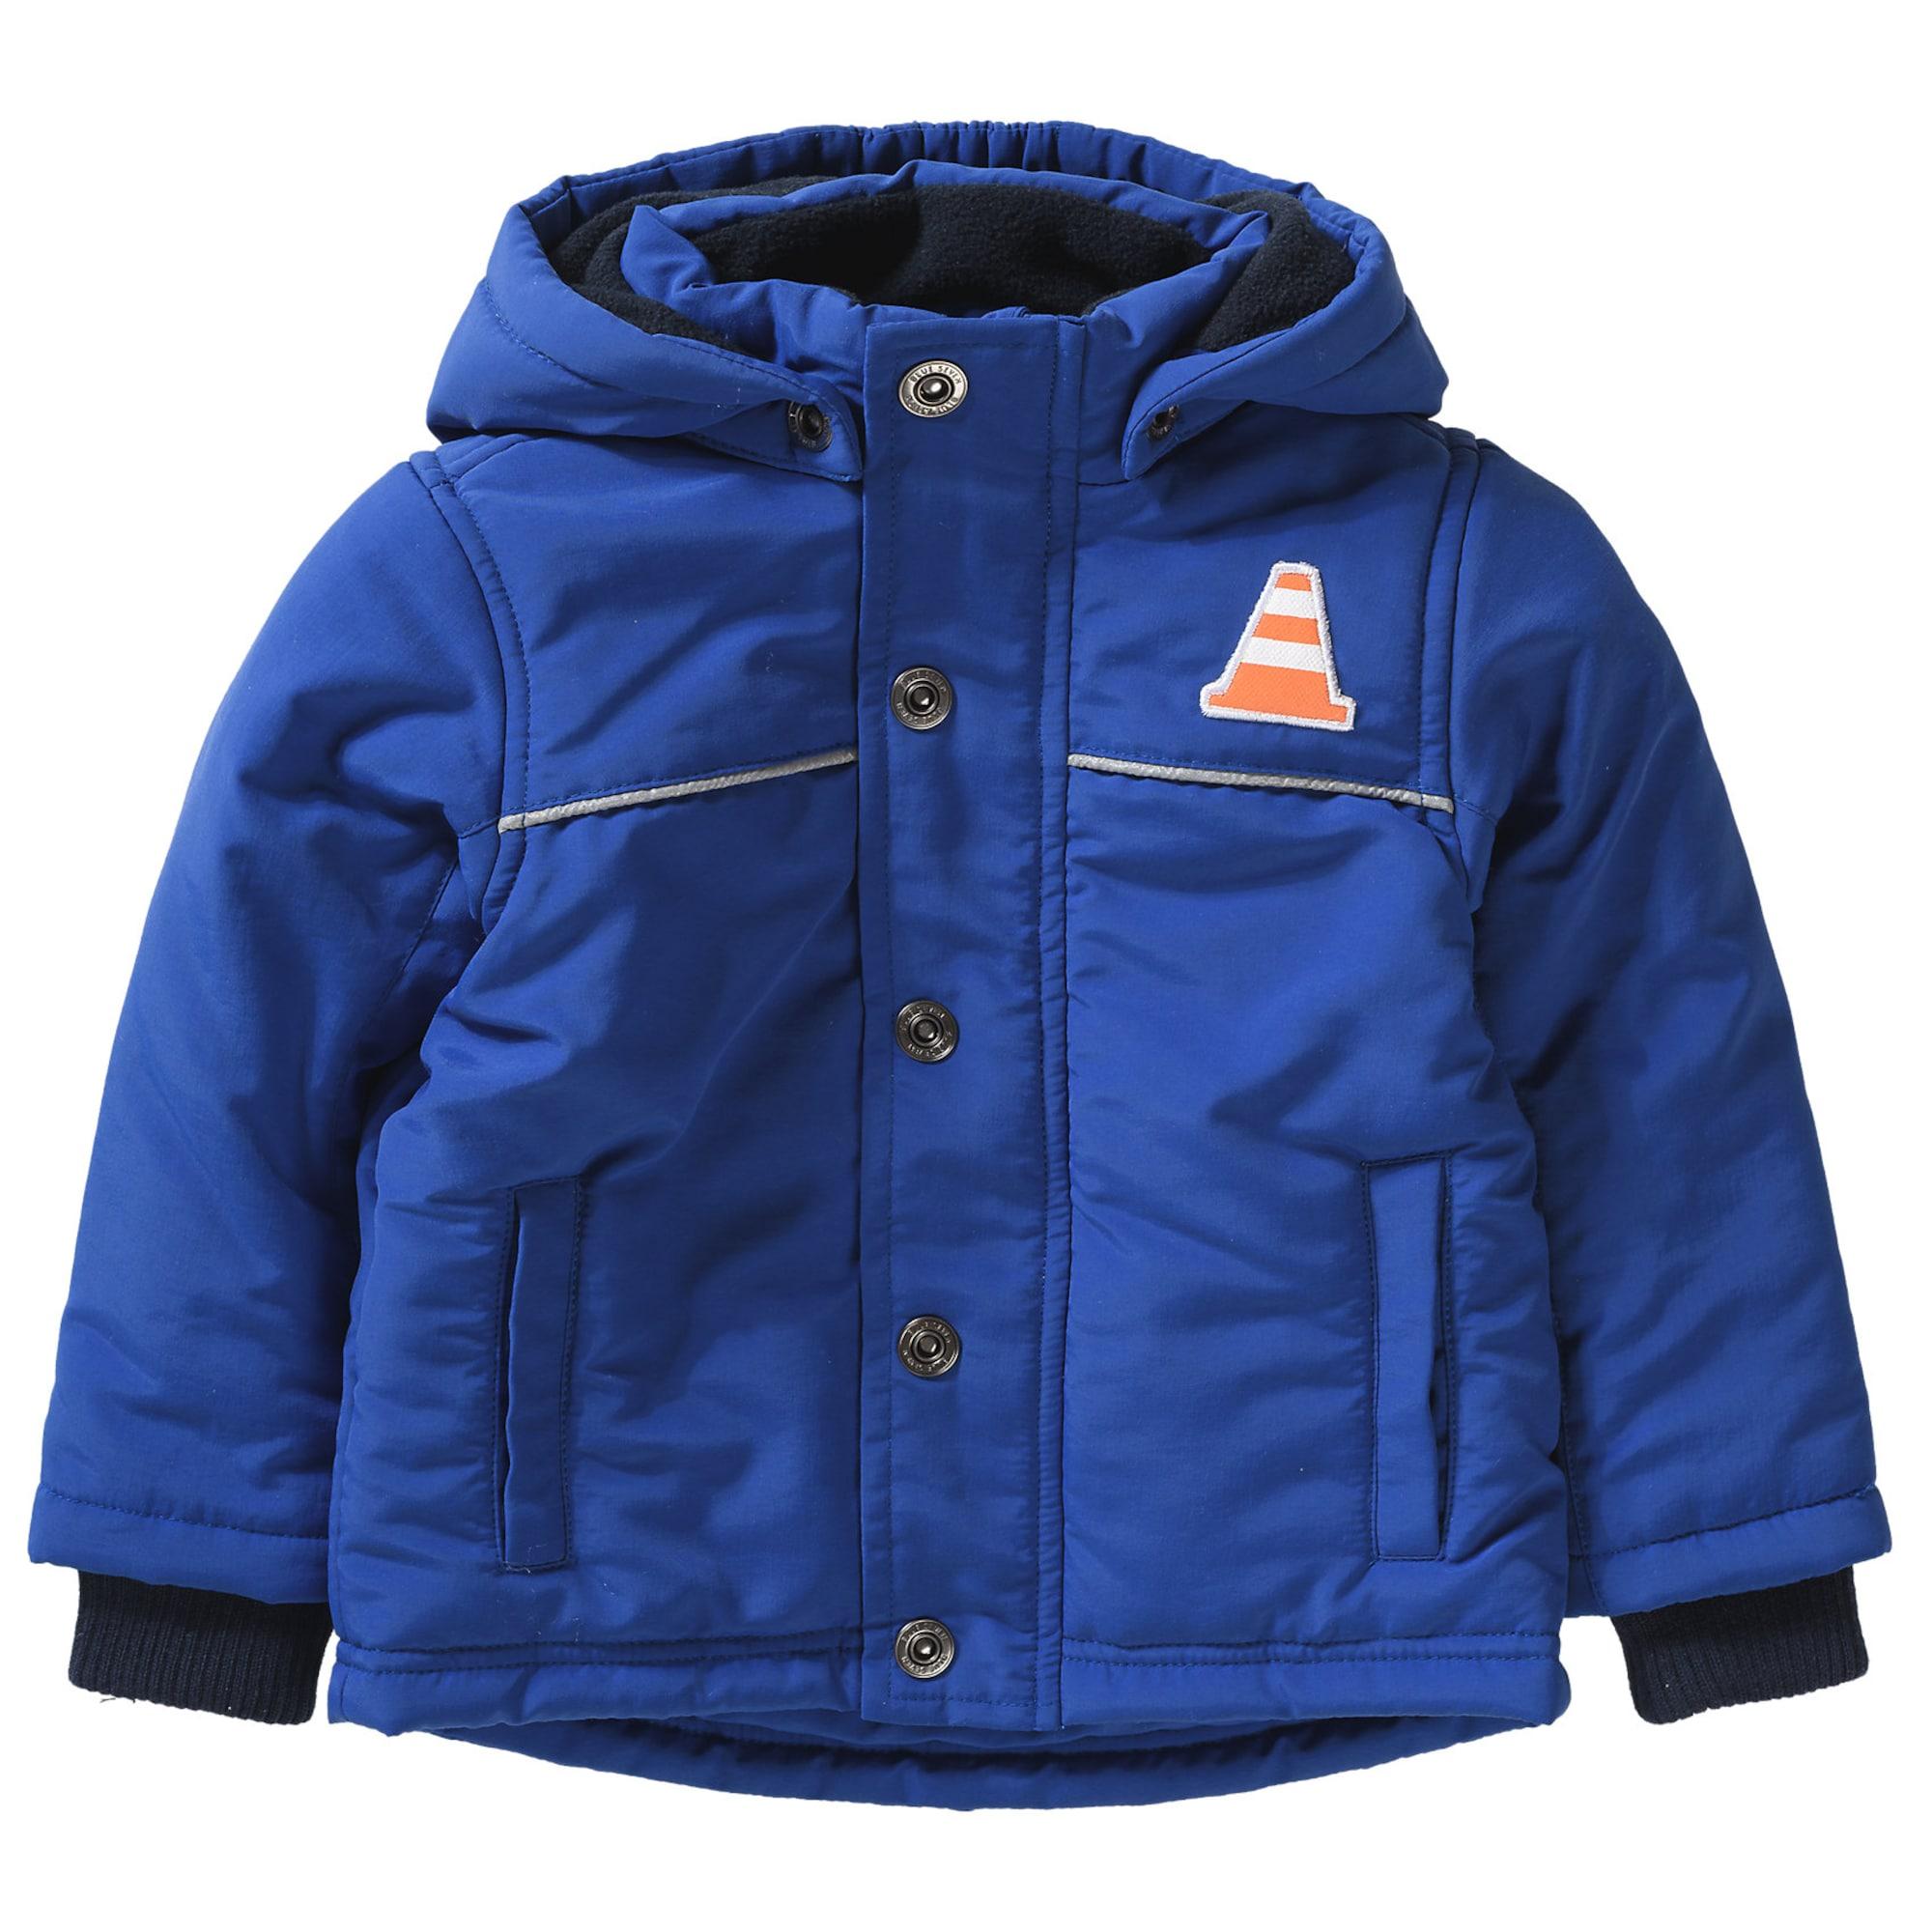 6a2f83ec50 Baby, Kinder, Jungen, Kinder, Kinder BLUE SEVEN Baby Winterjacke für Jungen  blau